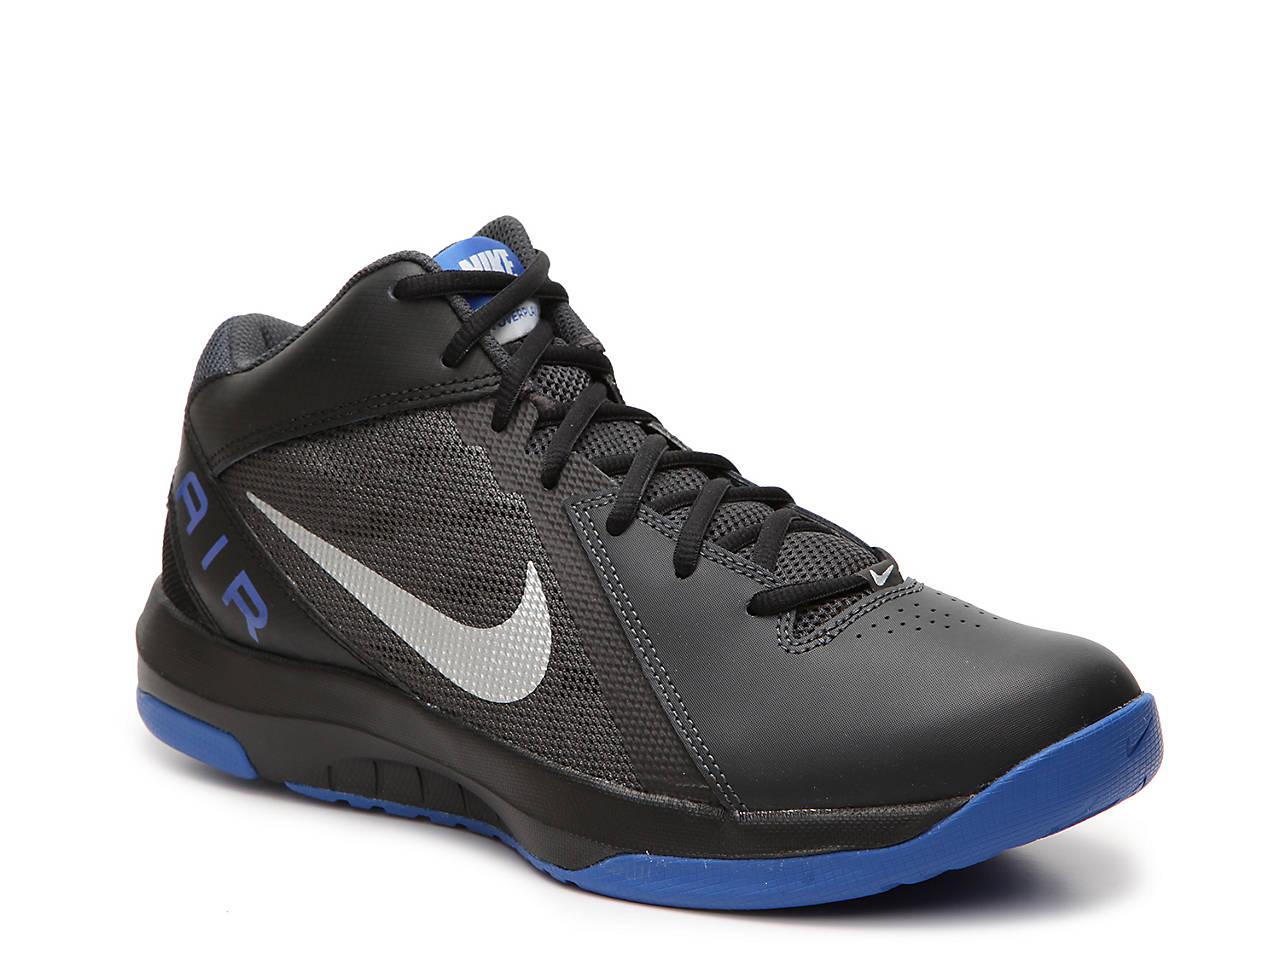 e9fc88bb41b8 Nike The Overplay IX Basketball Shoe - Men s Men s Shoes